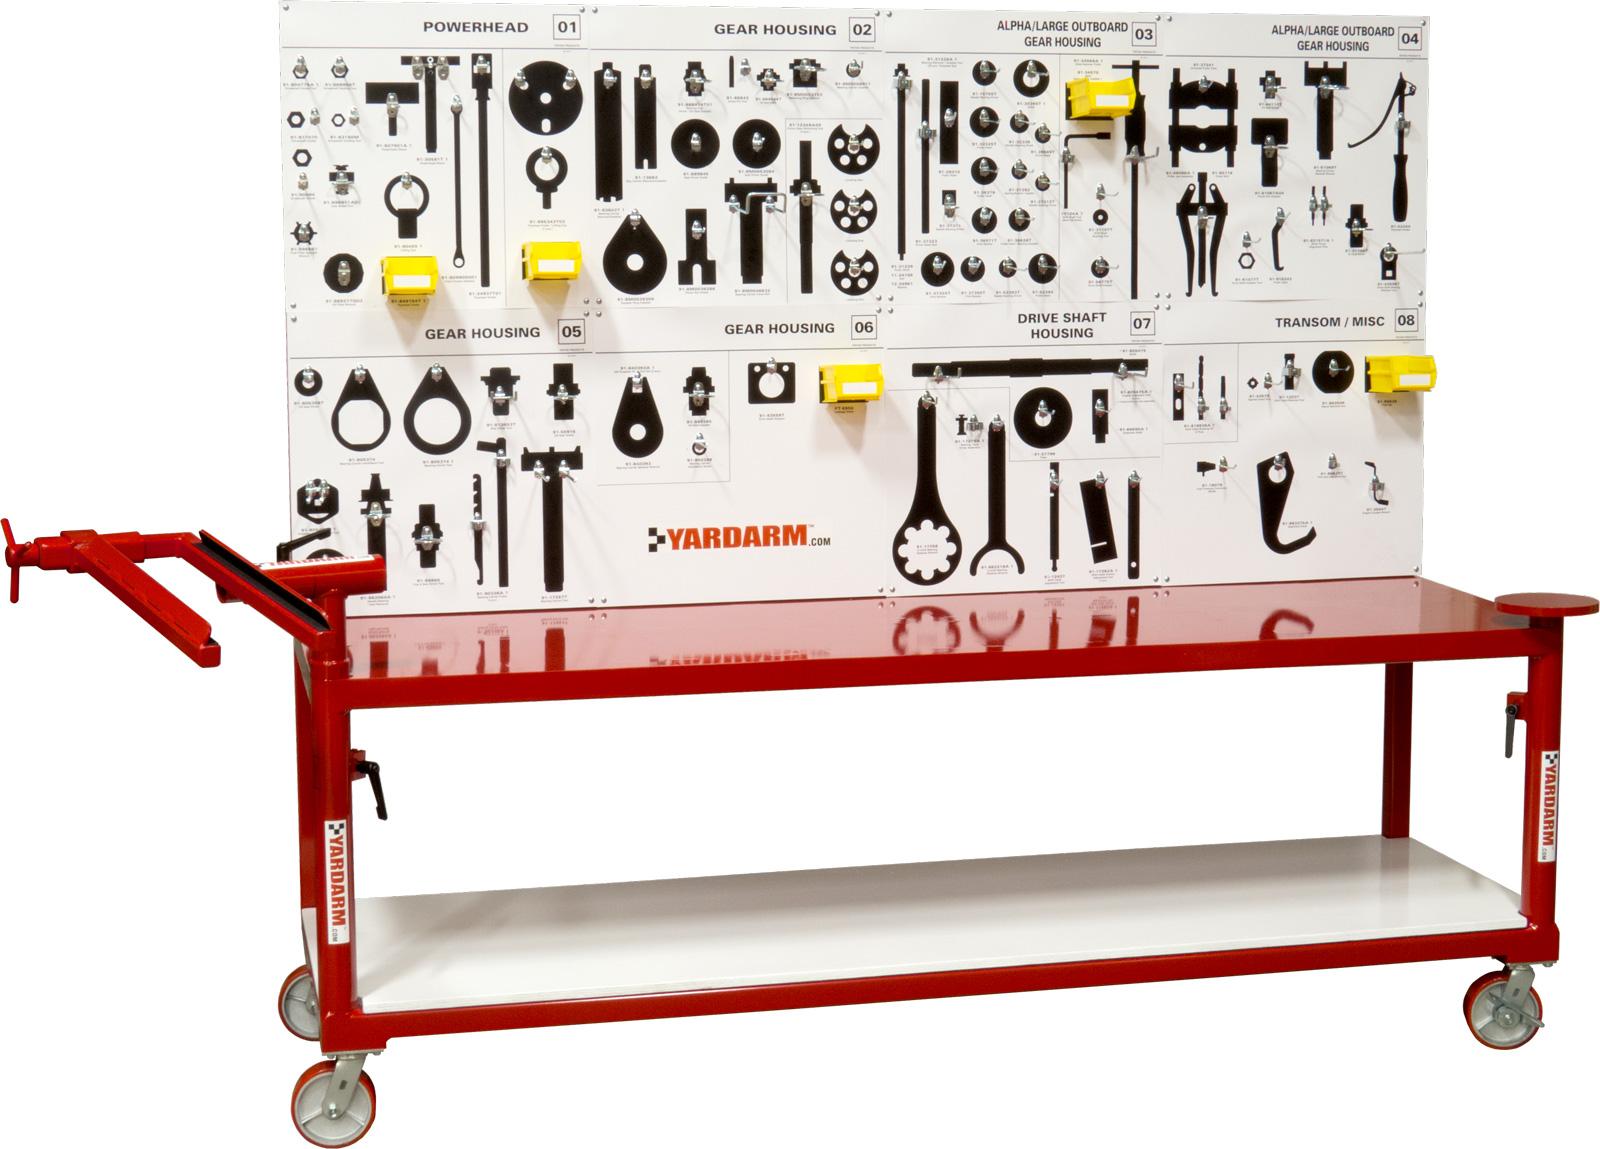 Yardarm - Marine Products & Metal Fabrication Specialists